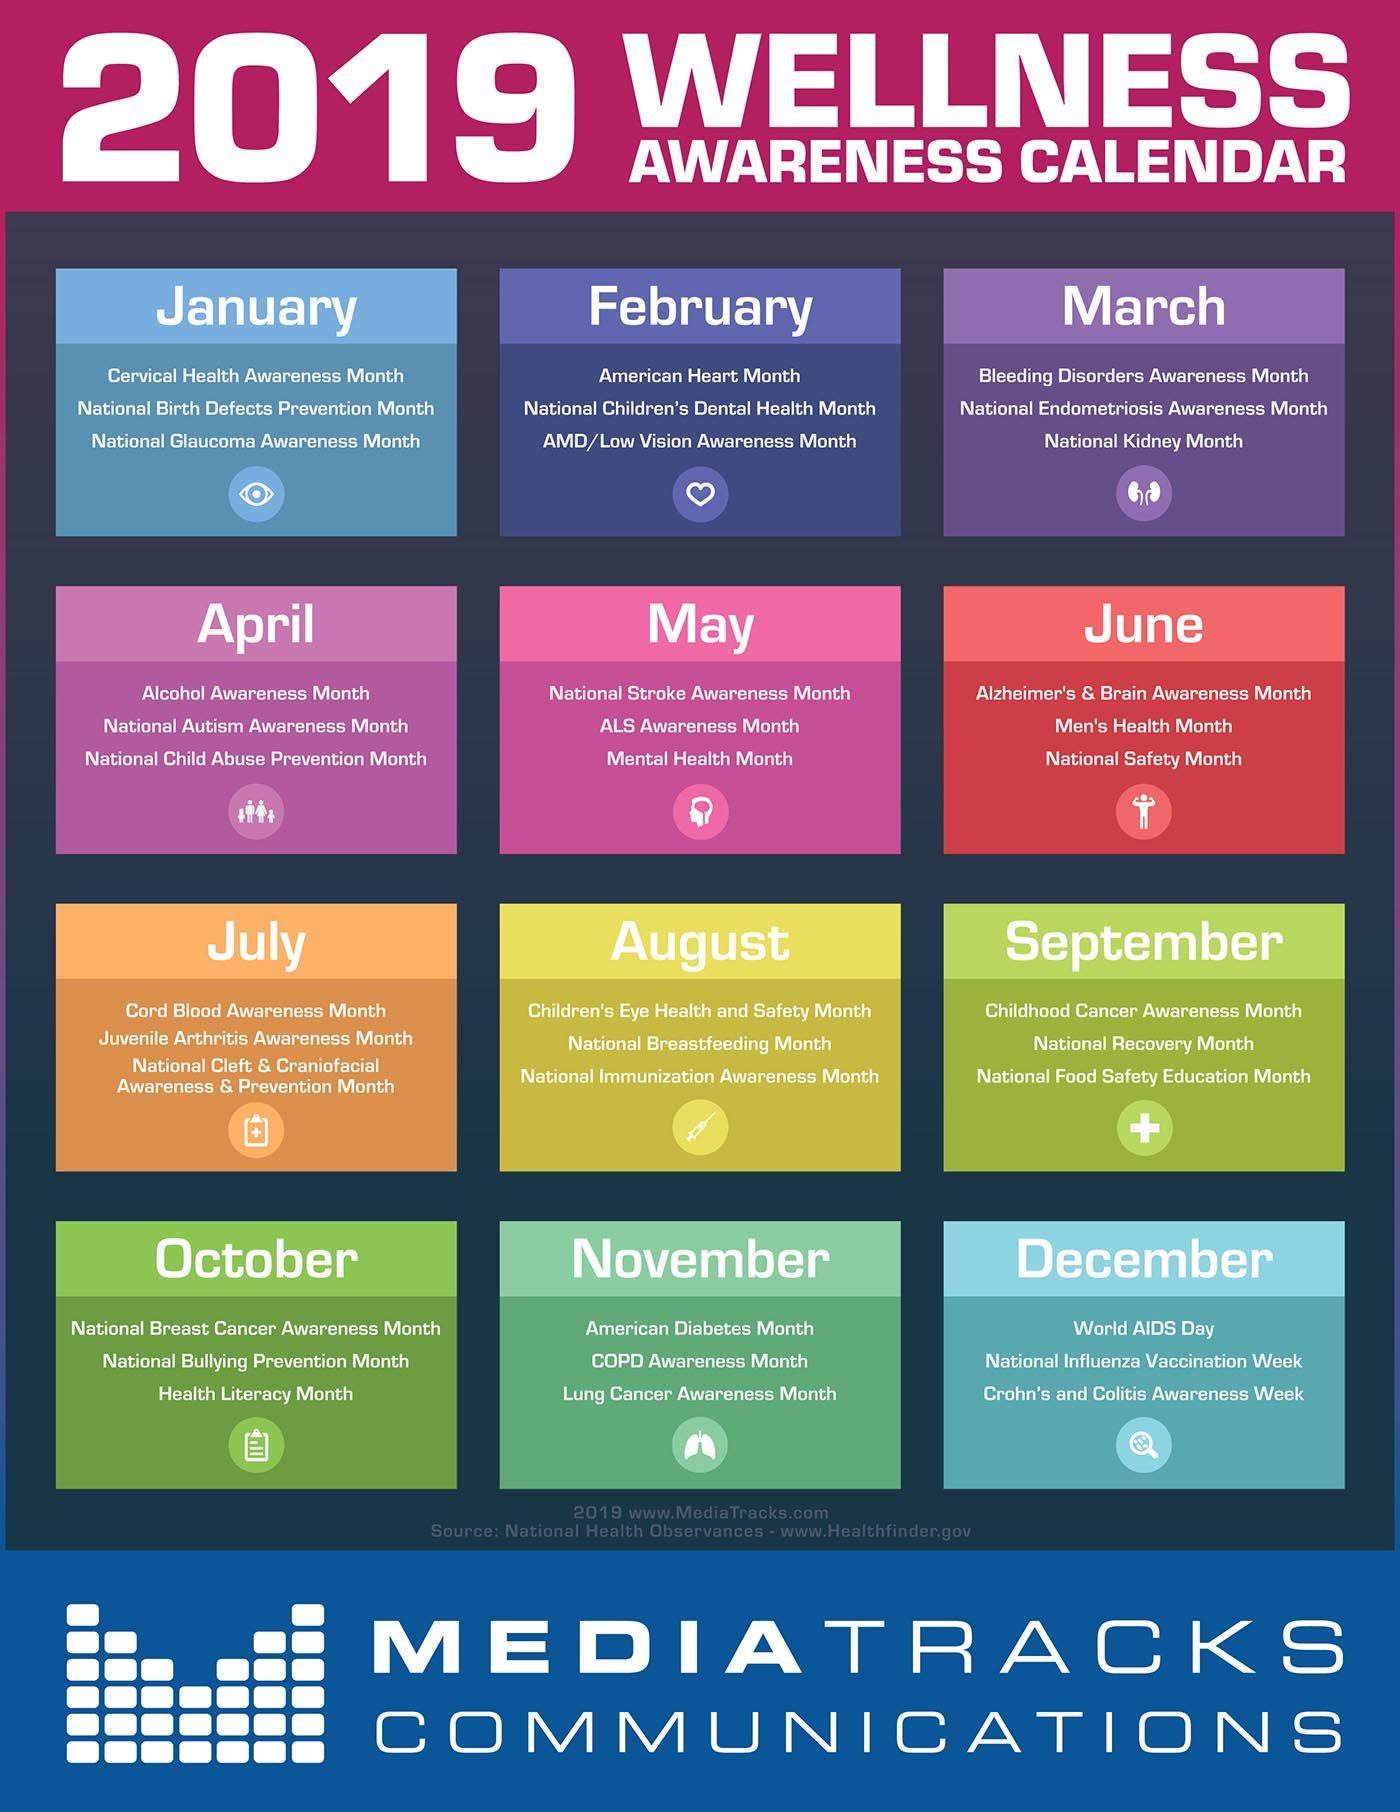 2019 Wellness Awareness Calendar [Infographic] - Mediatracks